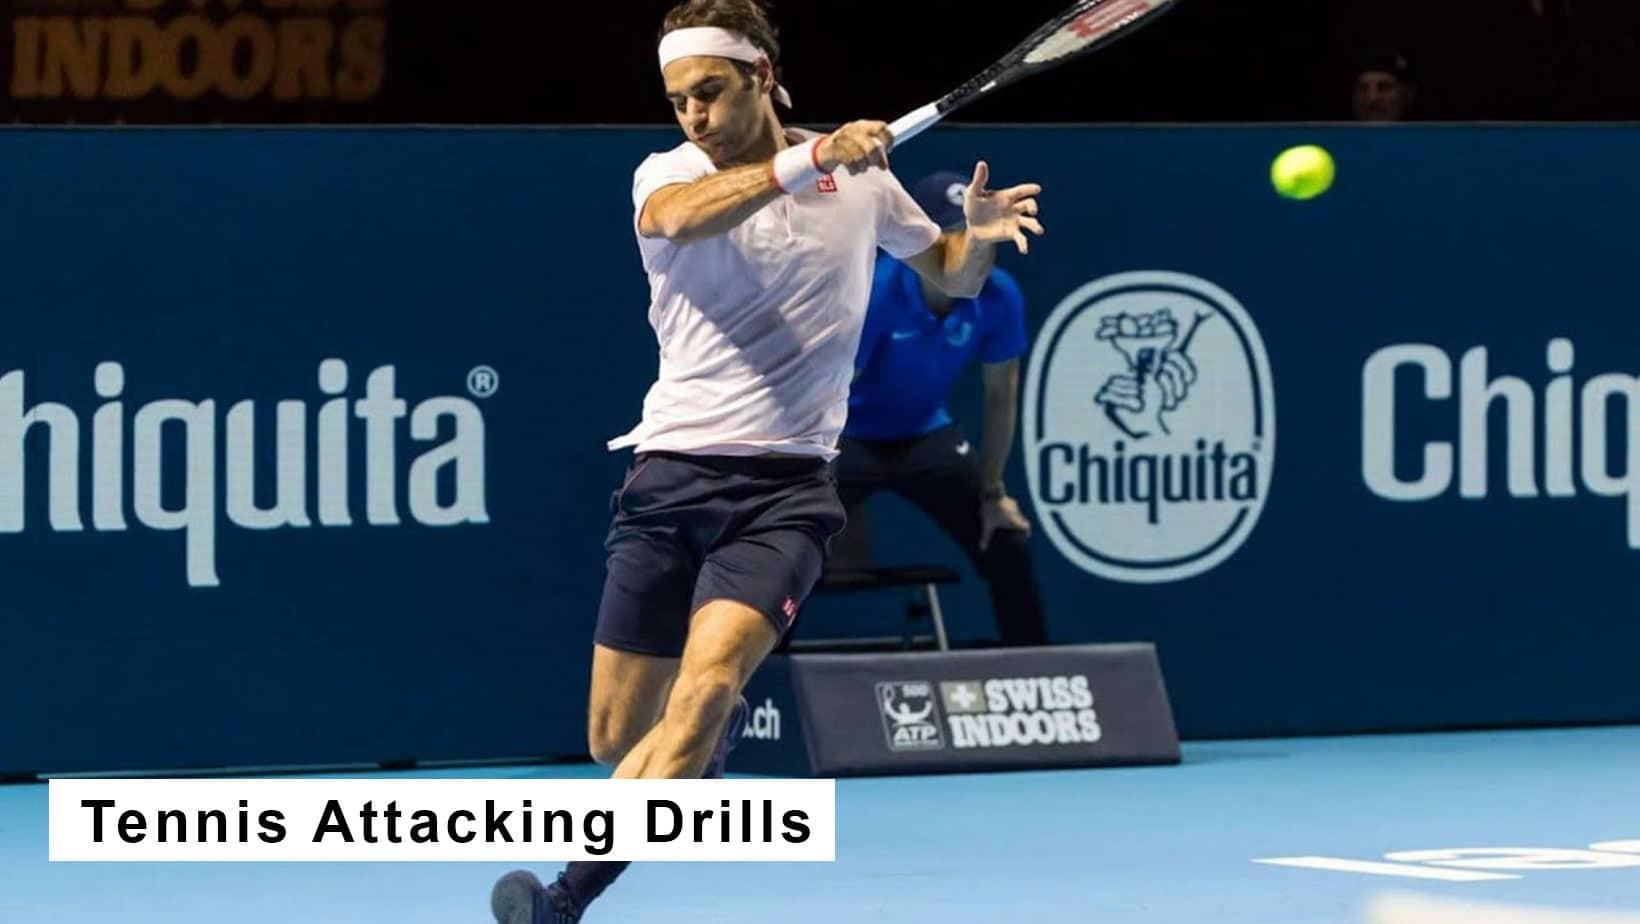 tennis attacking drills